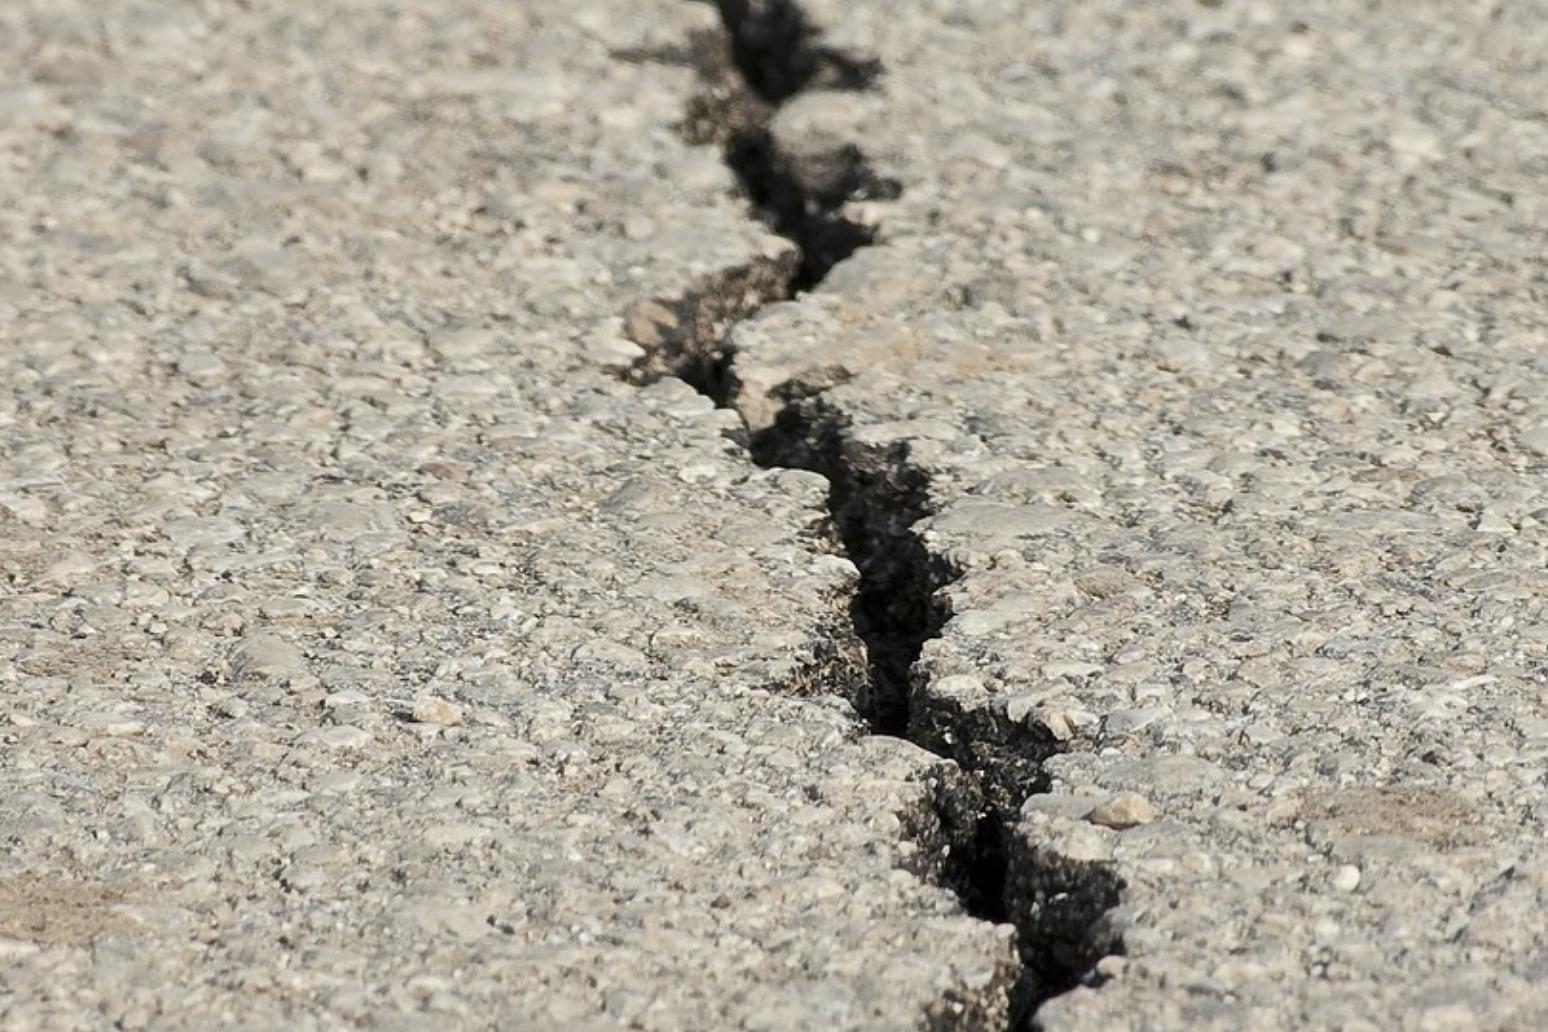 Earthquake strikes off New Caledonia